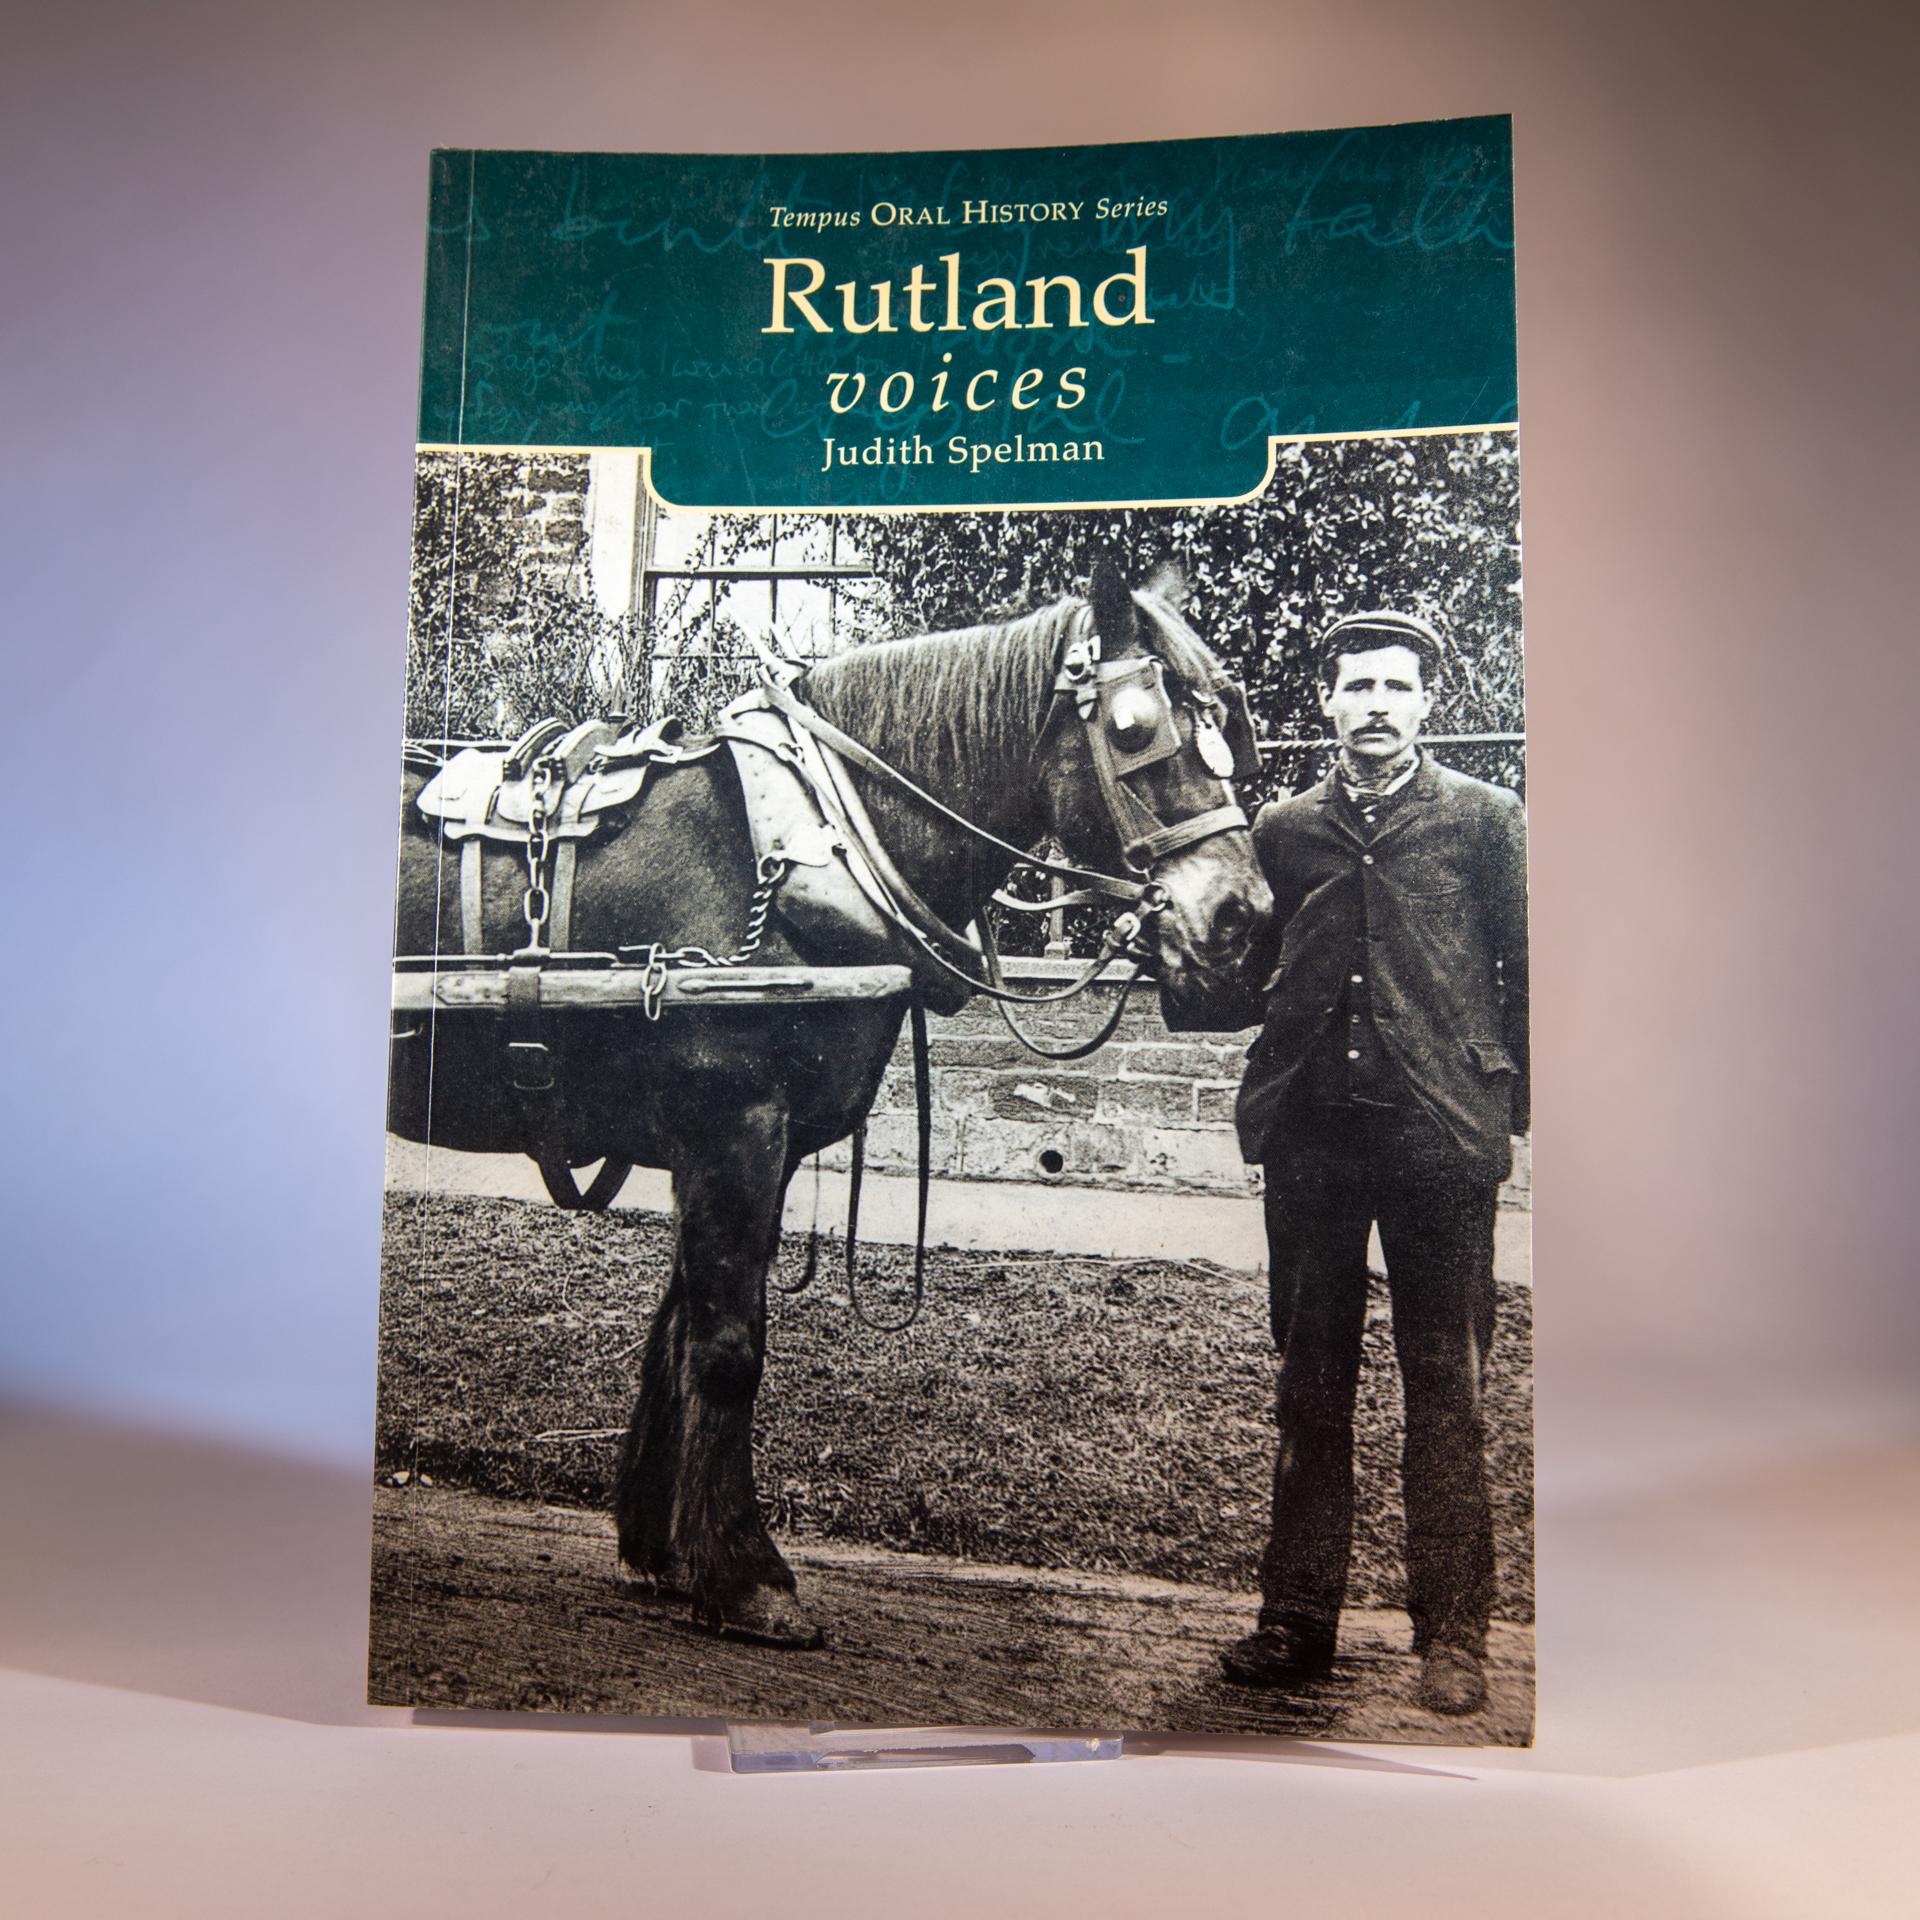 Rutland Voices